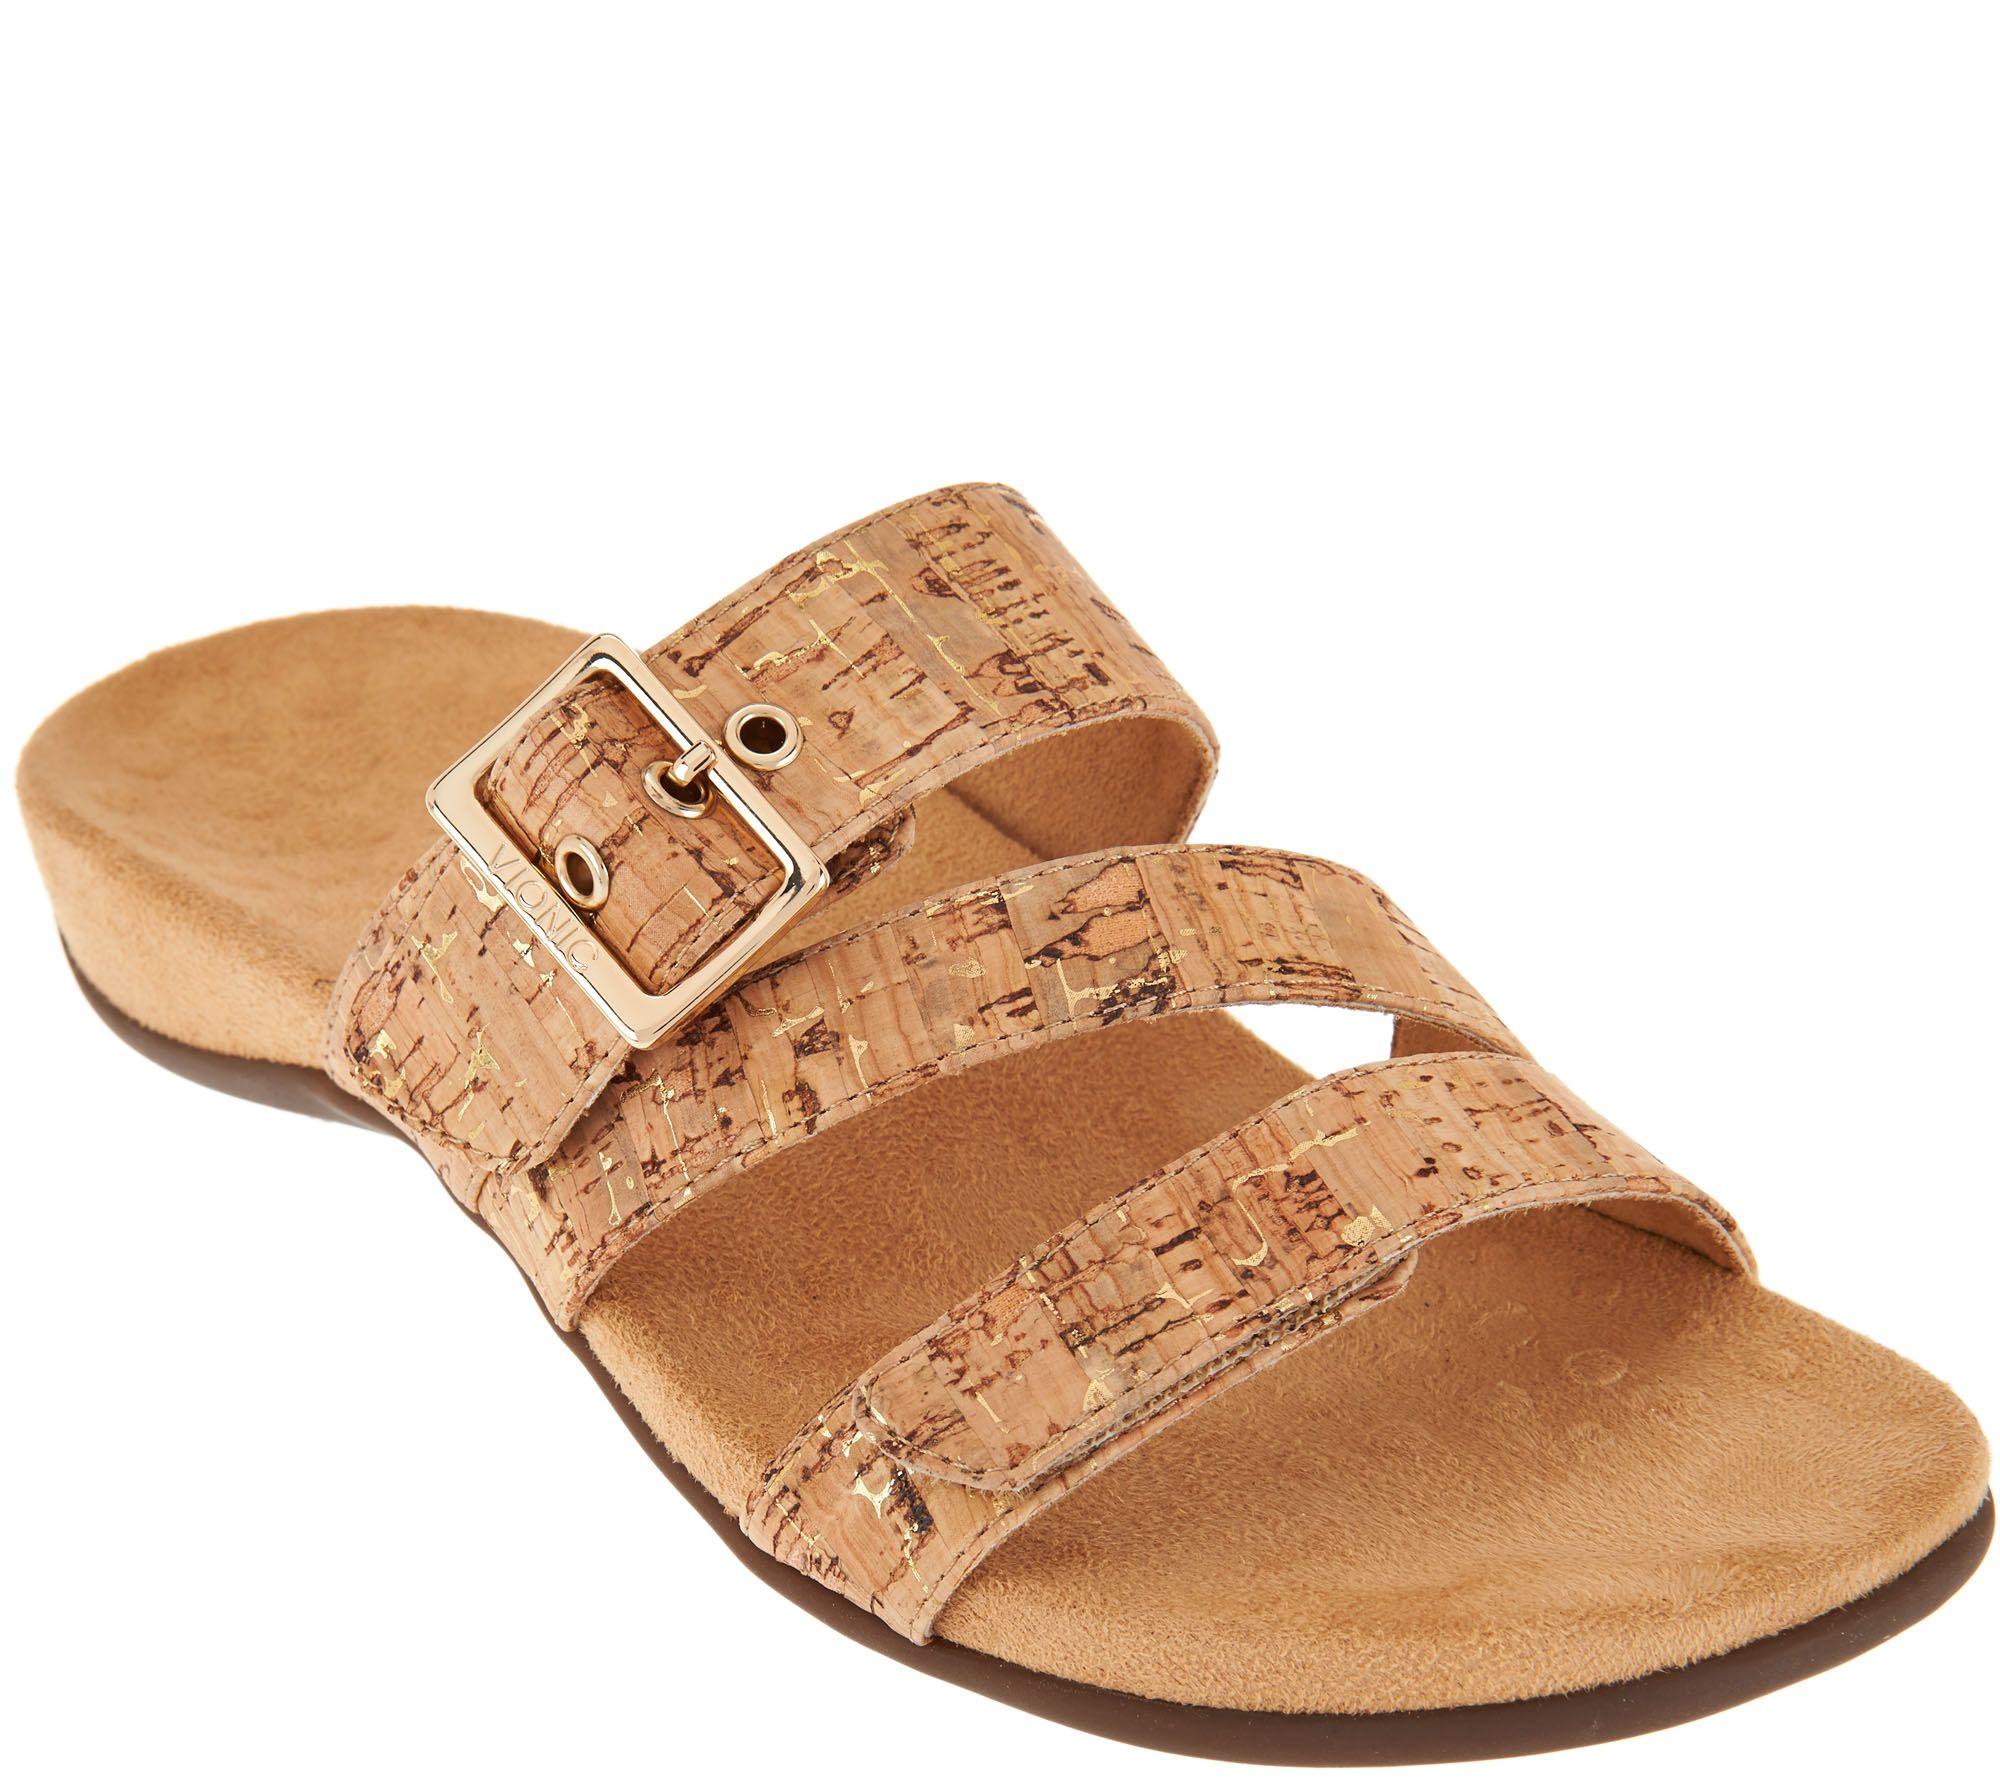 Vionic Adjustable Slide Sandals - Skylar — QVC.com